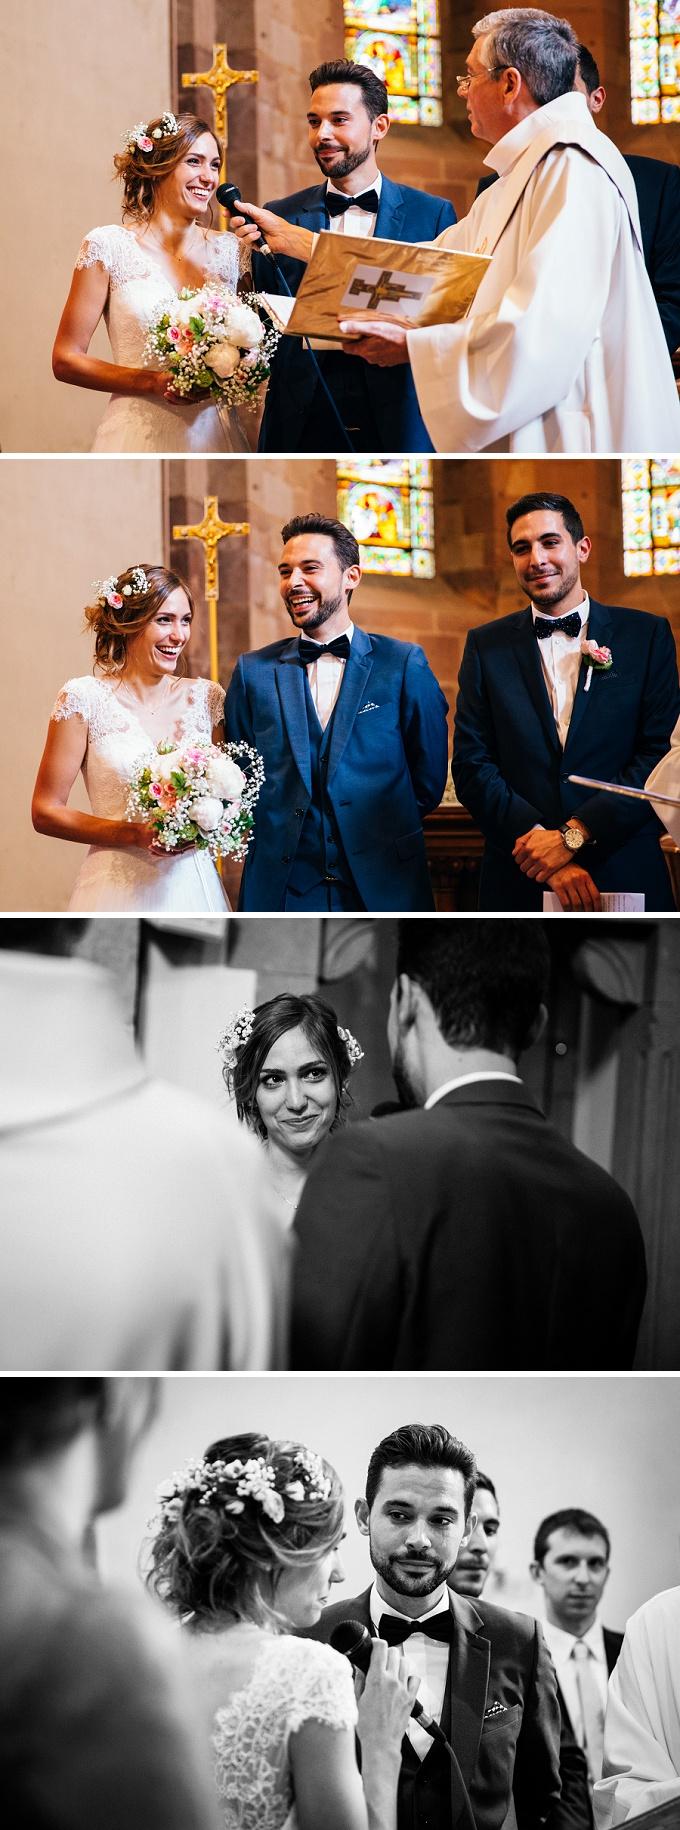 mariage-chateau-dosthoffen-013.jpg